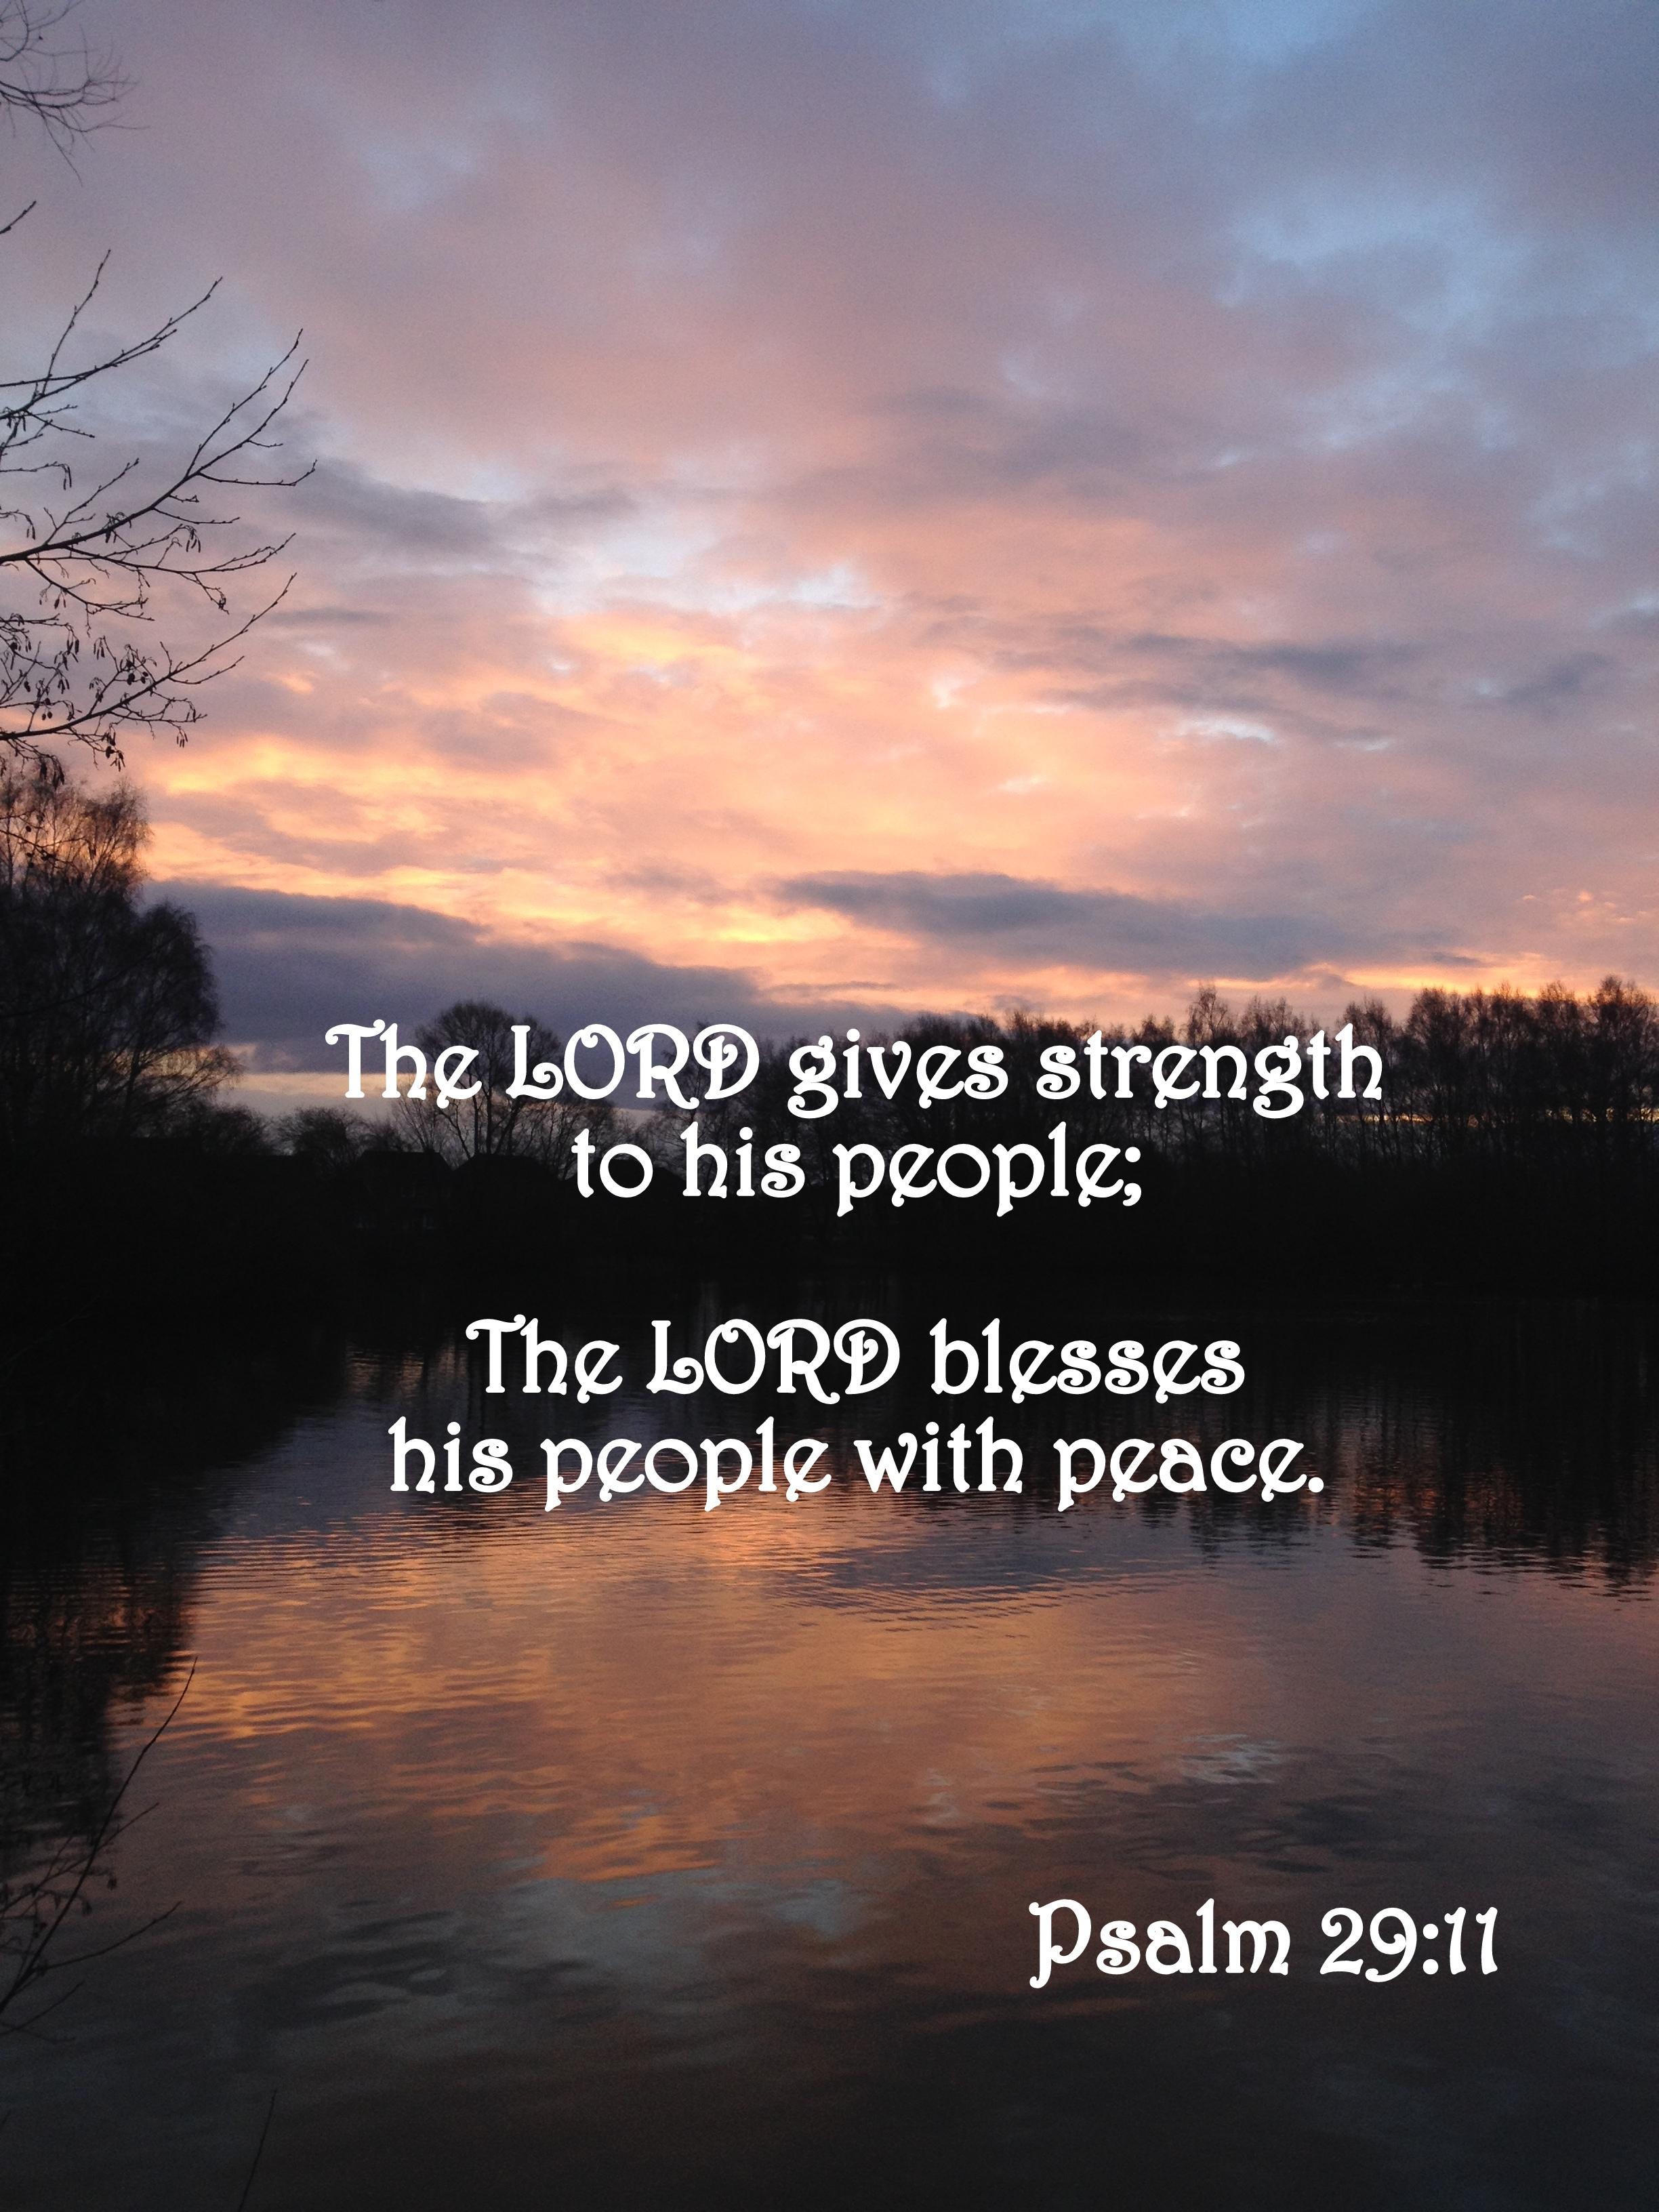 psalm-29-11.jpg